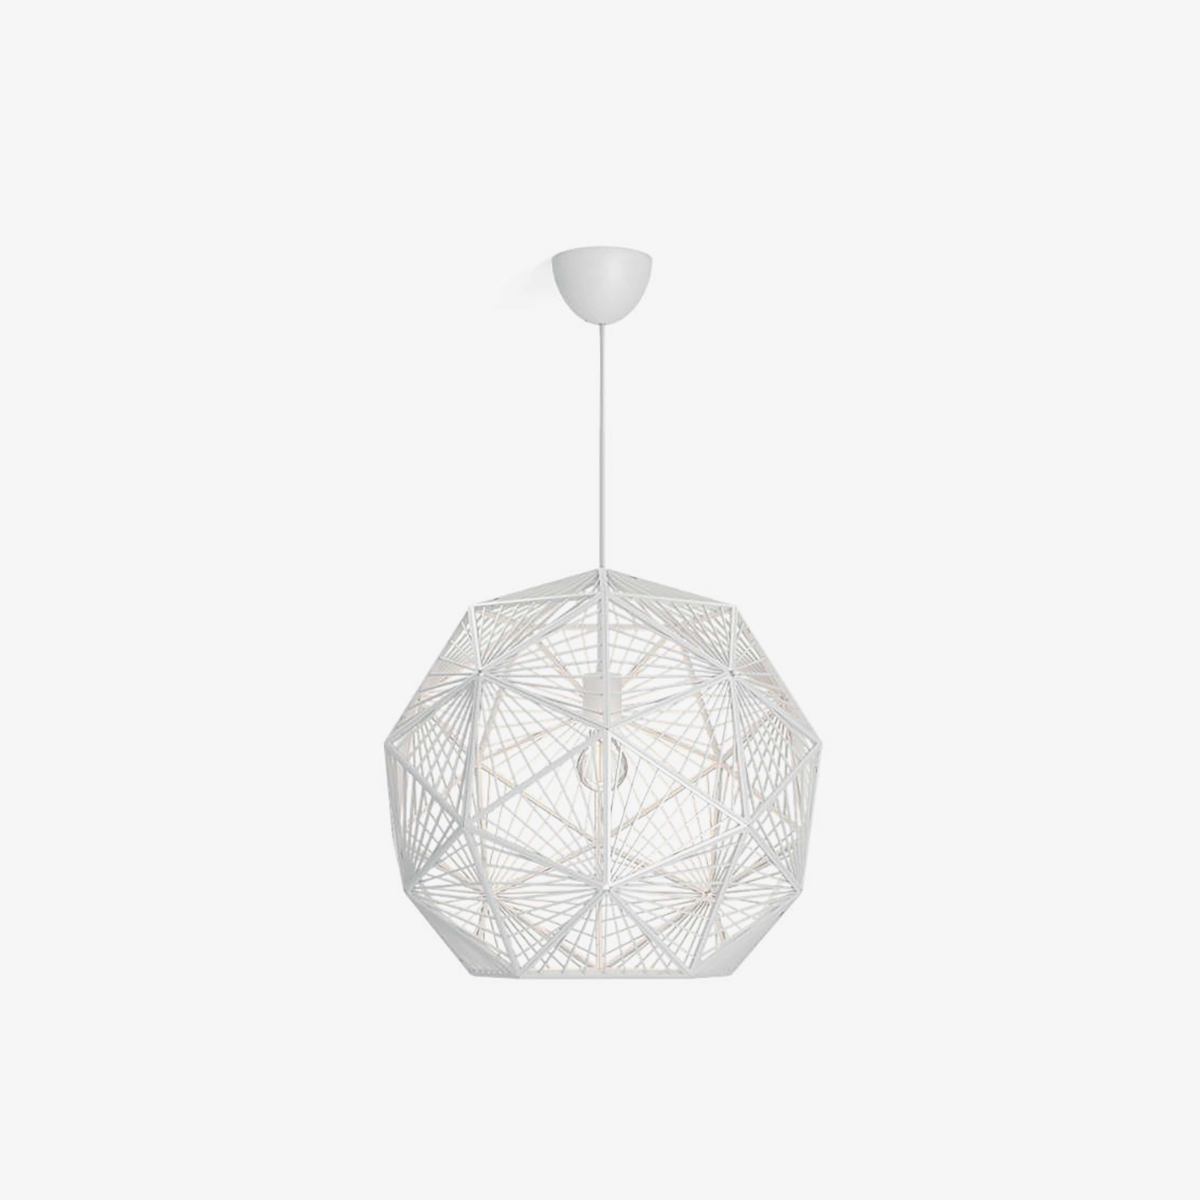 Lámpara colgante Mohair blanco Philips-0